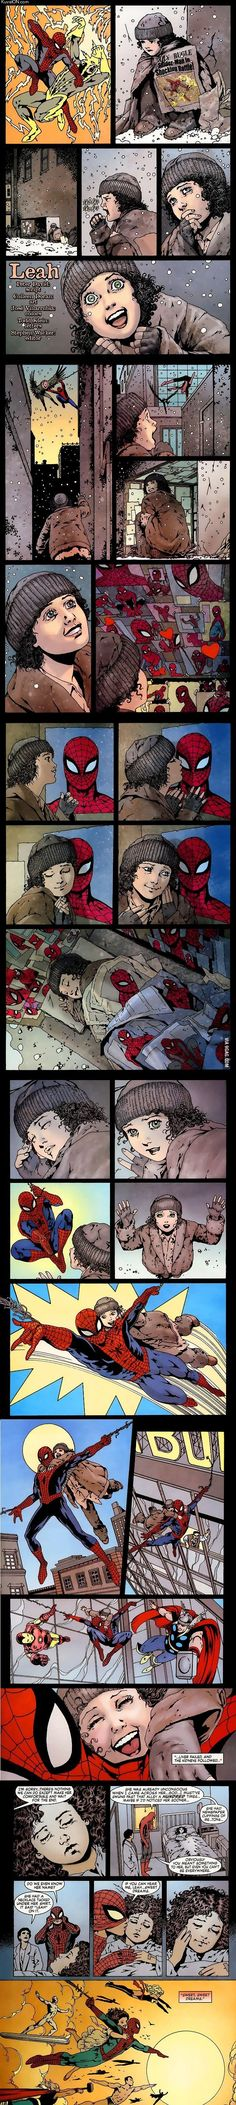 Seriously, Spiderman is full of sad all the time. Marvel Dc Comics, Sad Comics, Comics Story, Short Comics, Cute Comics, Marvel Heroes, Marvel Avengers, Spiderman, Mini Comic